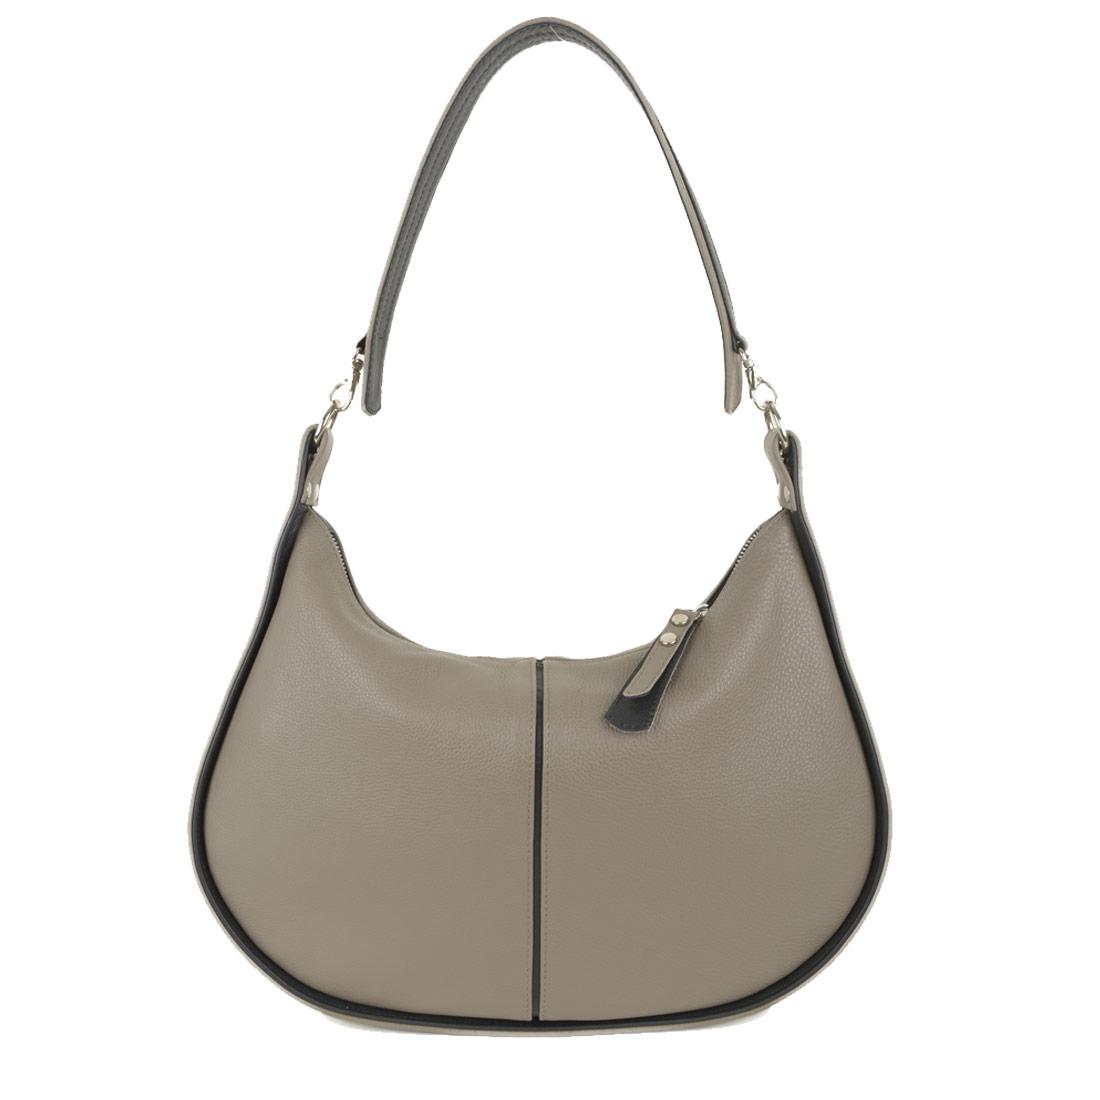 Lizzie Taupe Leather Shoulder Bag